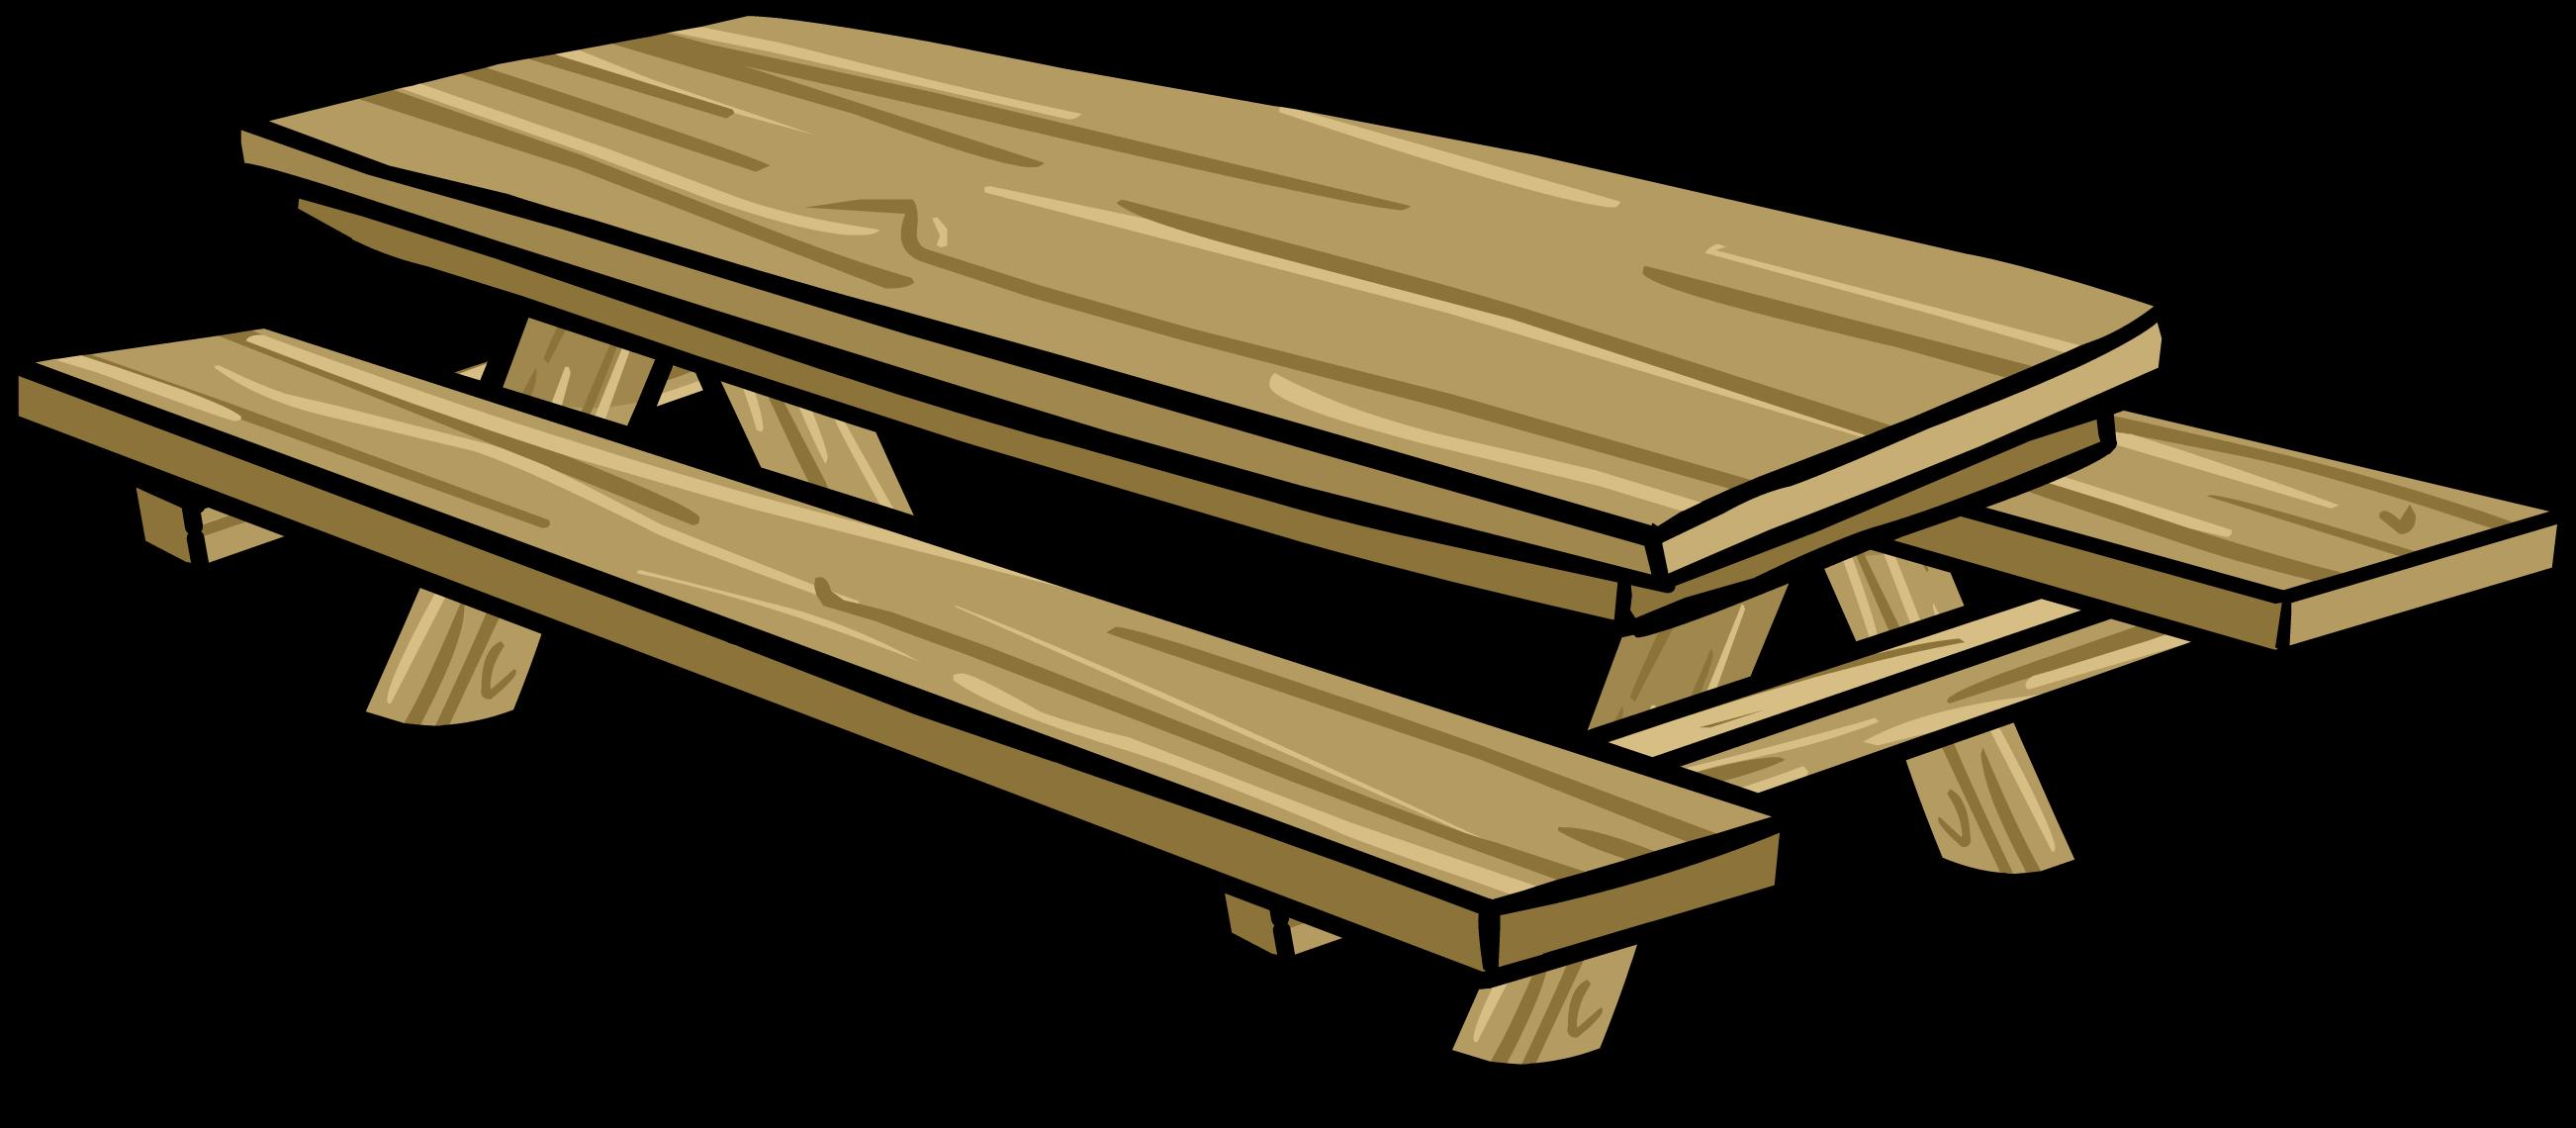 image picnic table sprite 003 png club penguin wiki fandom rh clubpenguin wikia com Picnic Basket Clip Art picnic table with food clipart